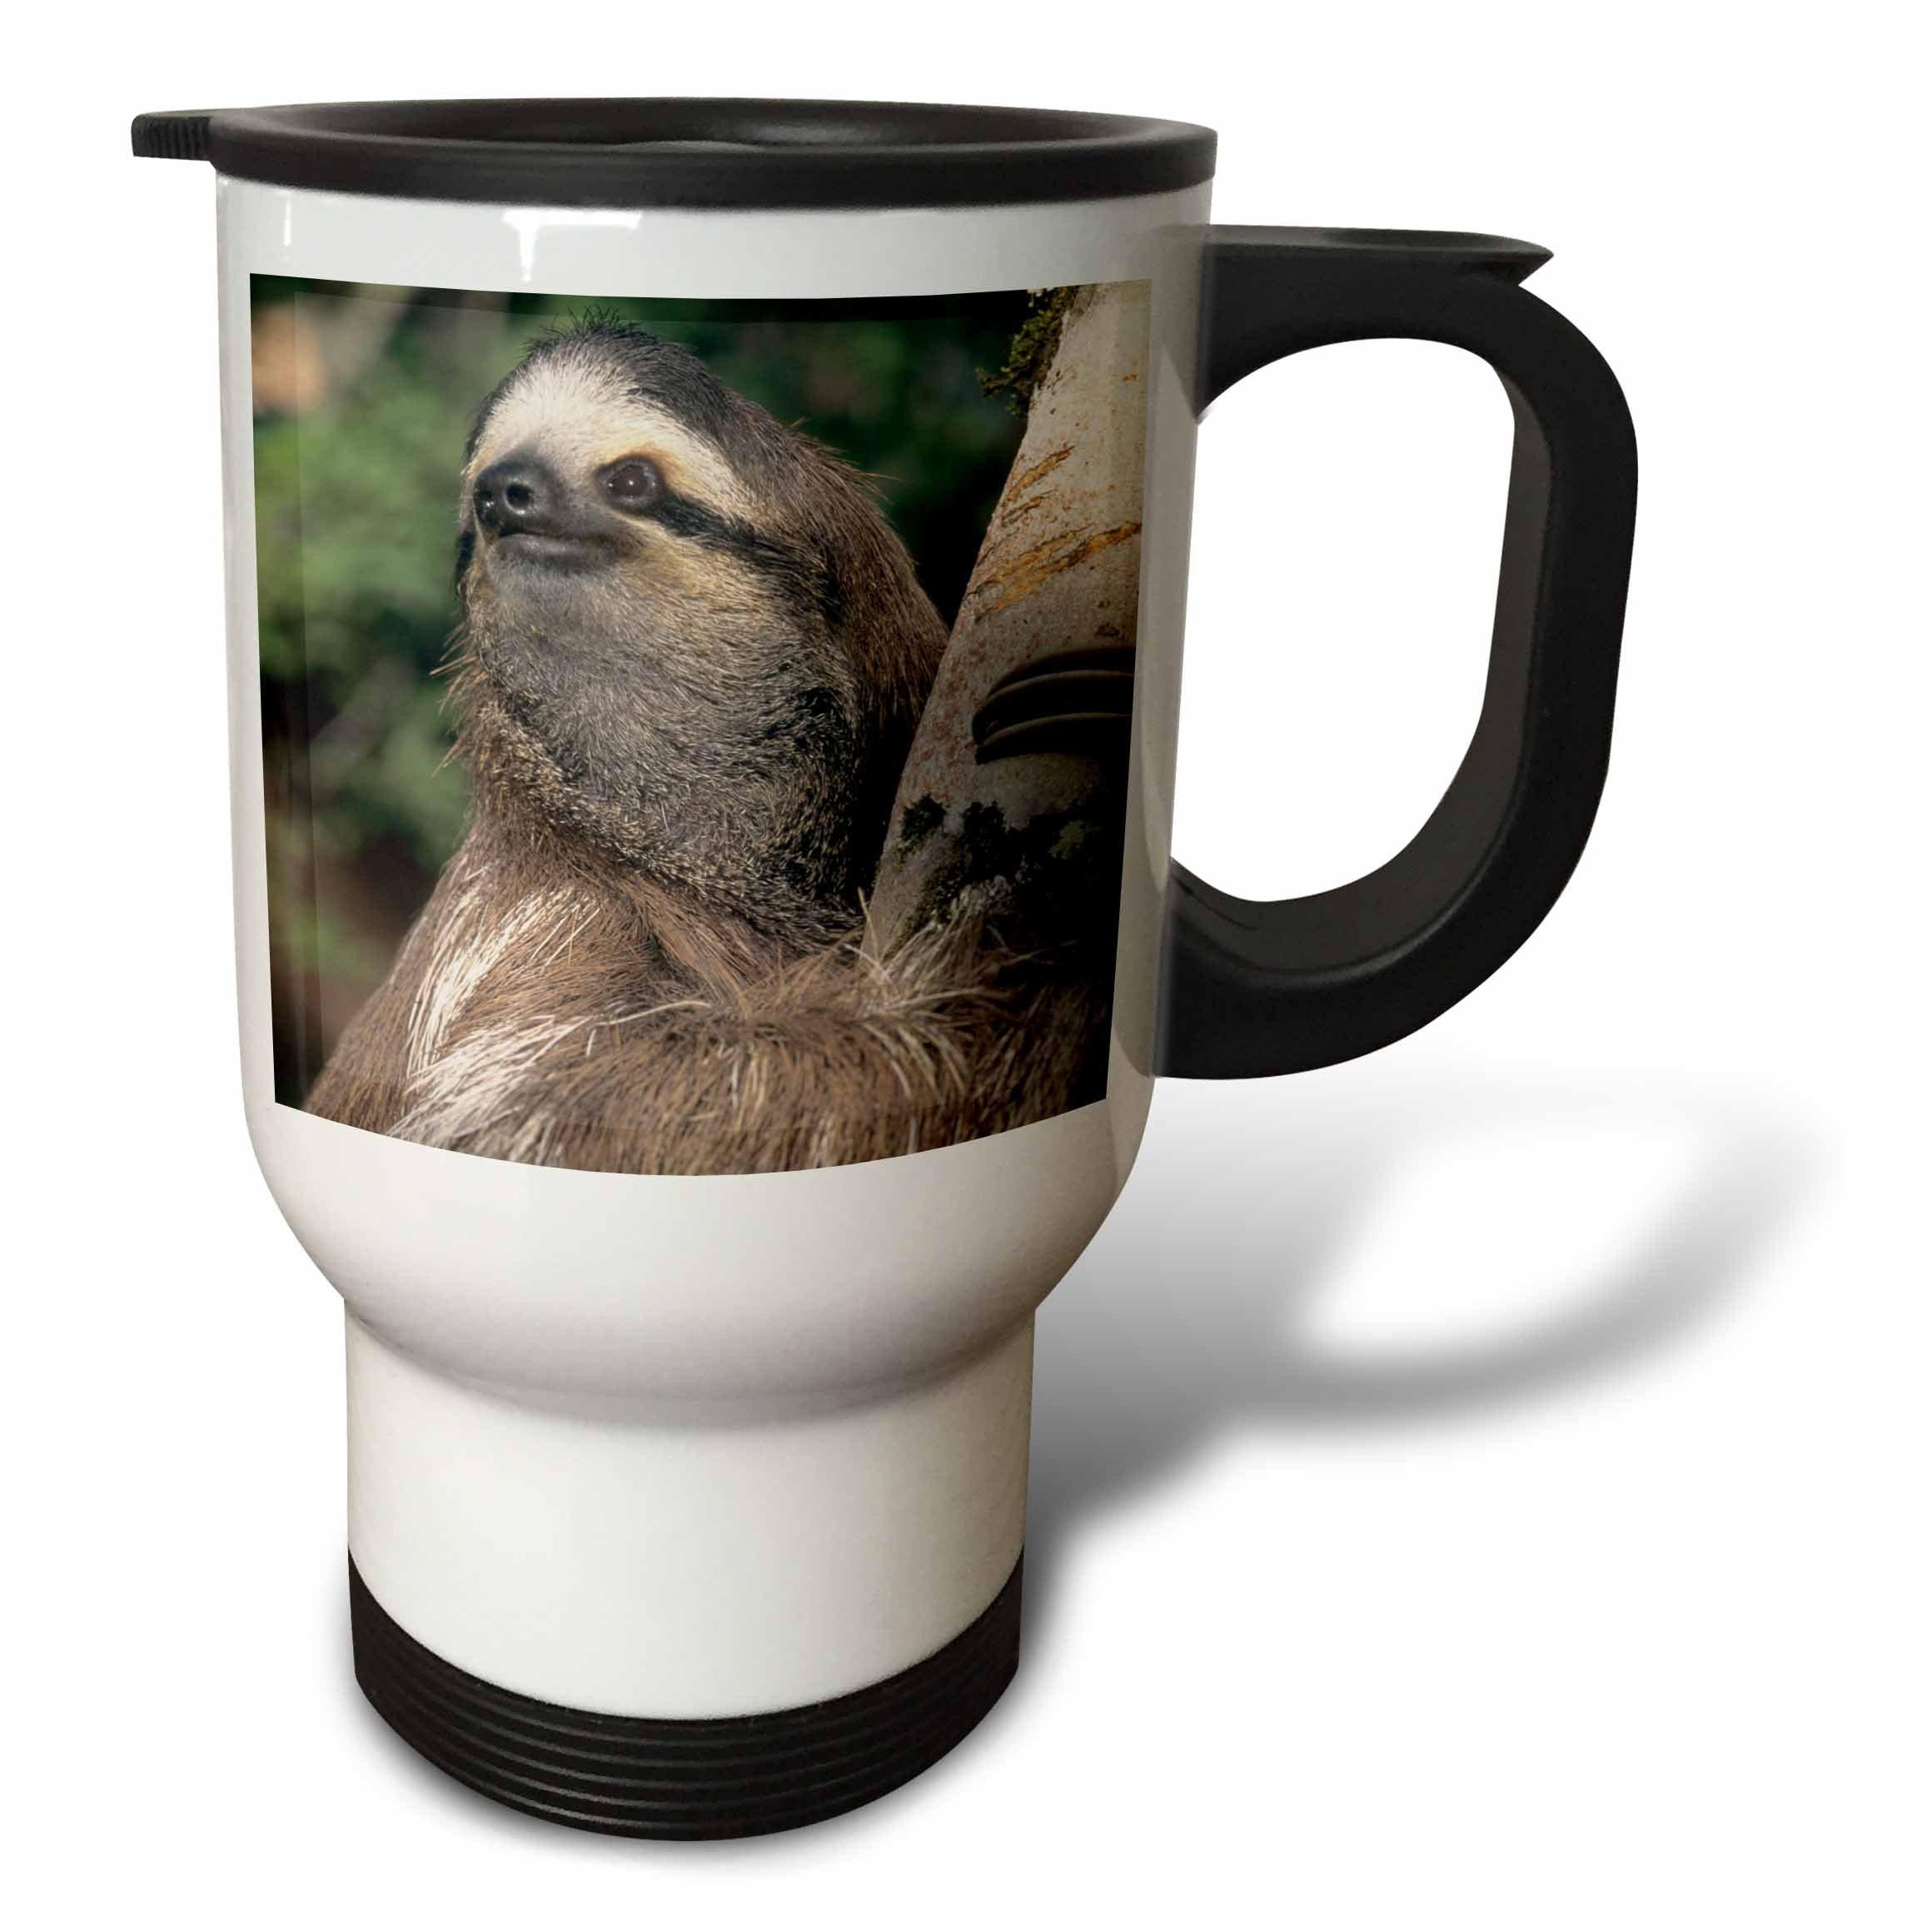 3dRose Three-Toed Sloth Wildlife-Corcovado Np-Costa Rica, Stainless Steel Travel Mug, 14-Oz